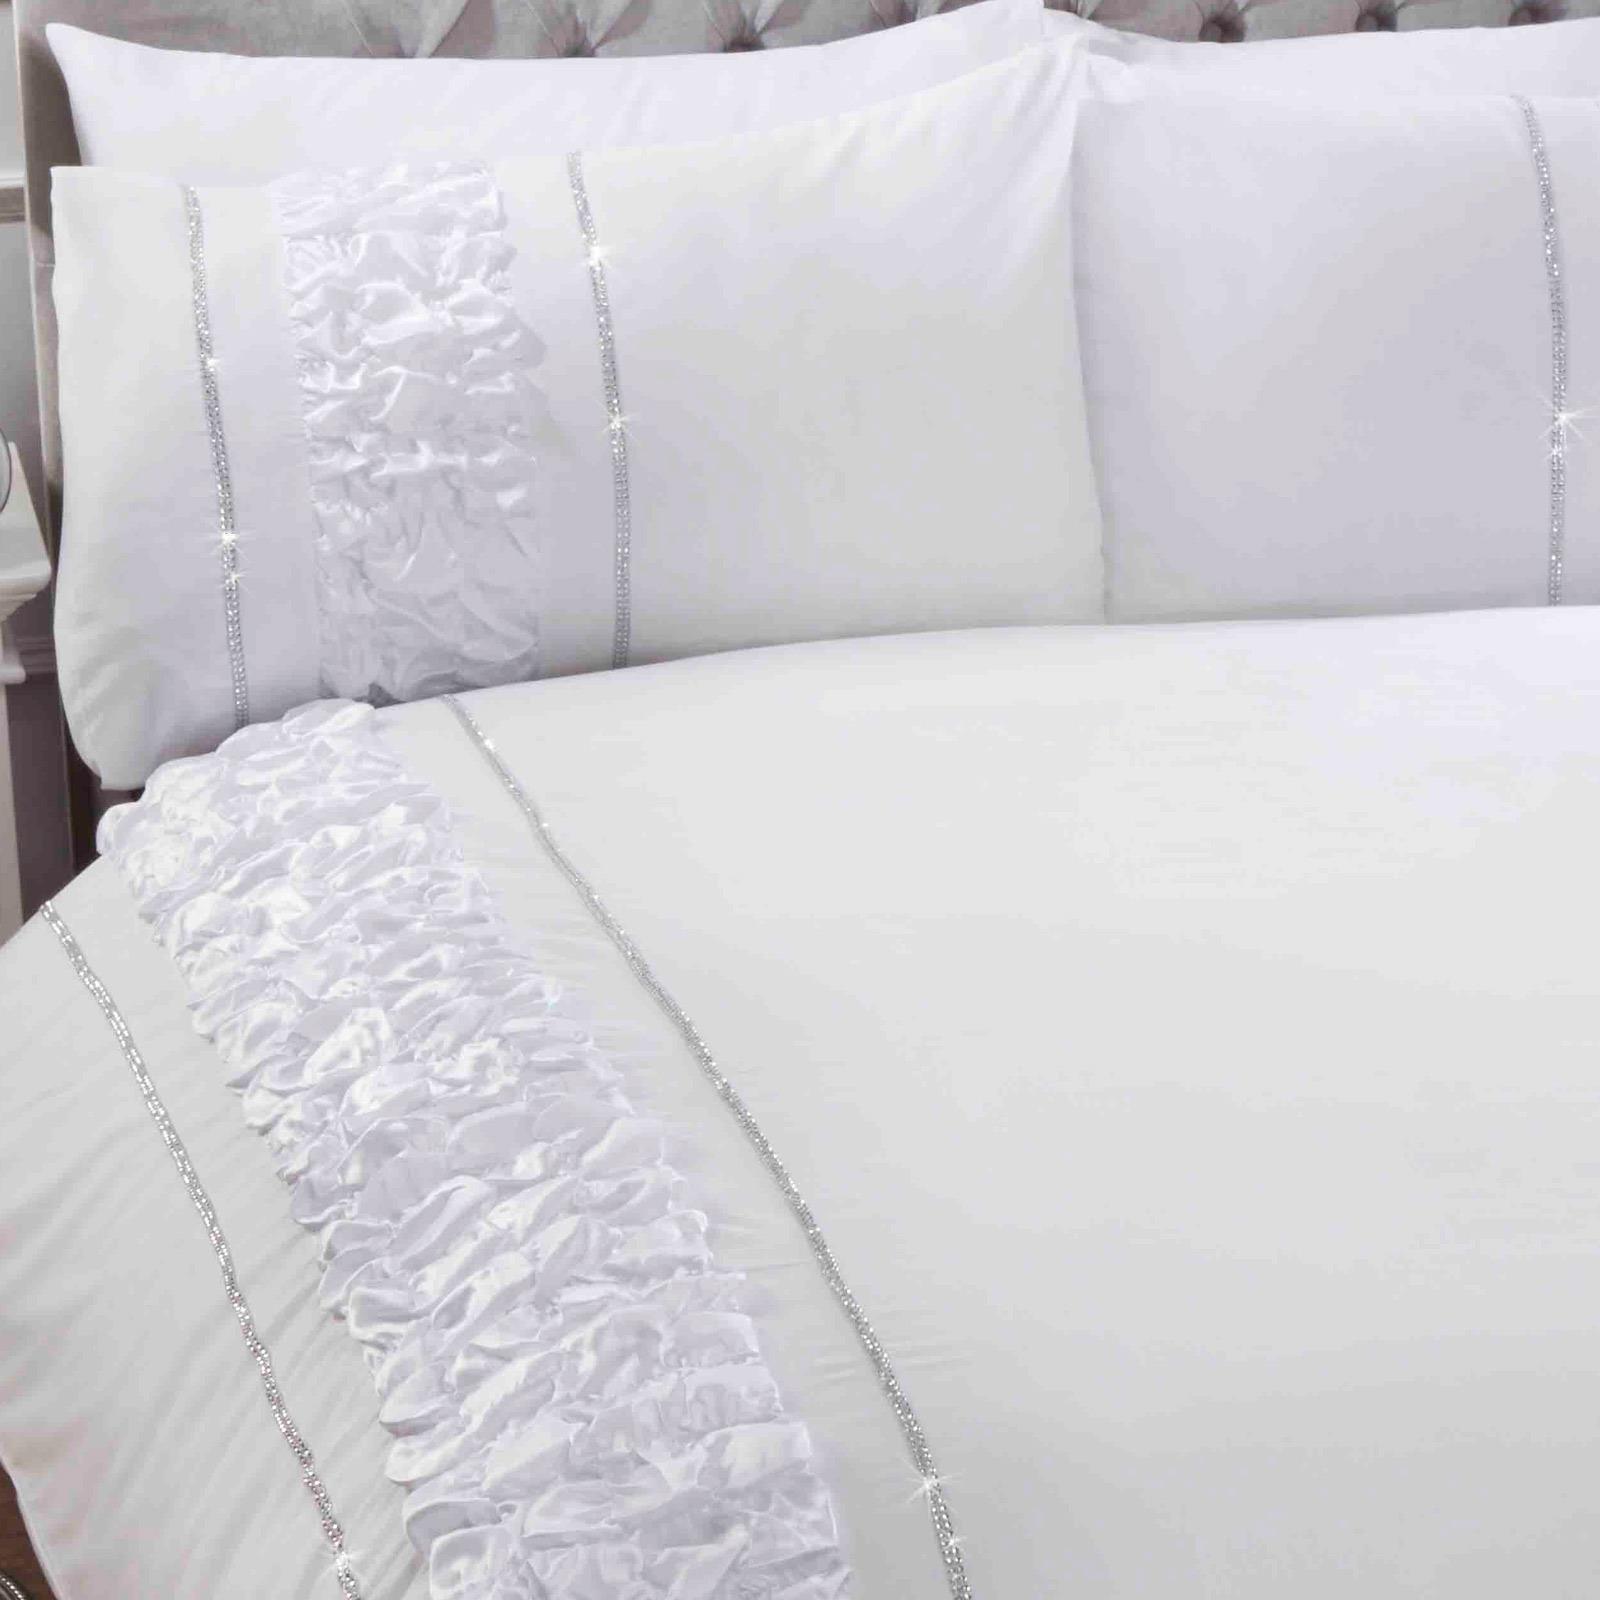 Blanco-Fundas-nordicas-Provence-Sparkle-Bling-Diamante-cubierta-del-edredon-conjuntos-de-cama miniatura 10